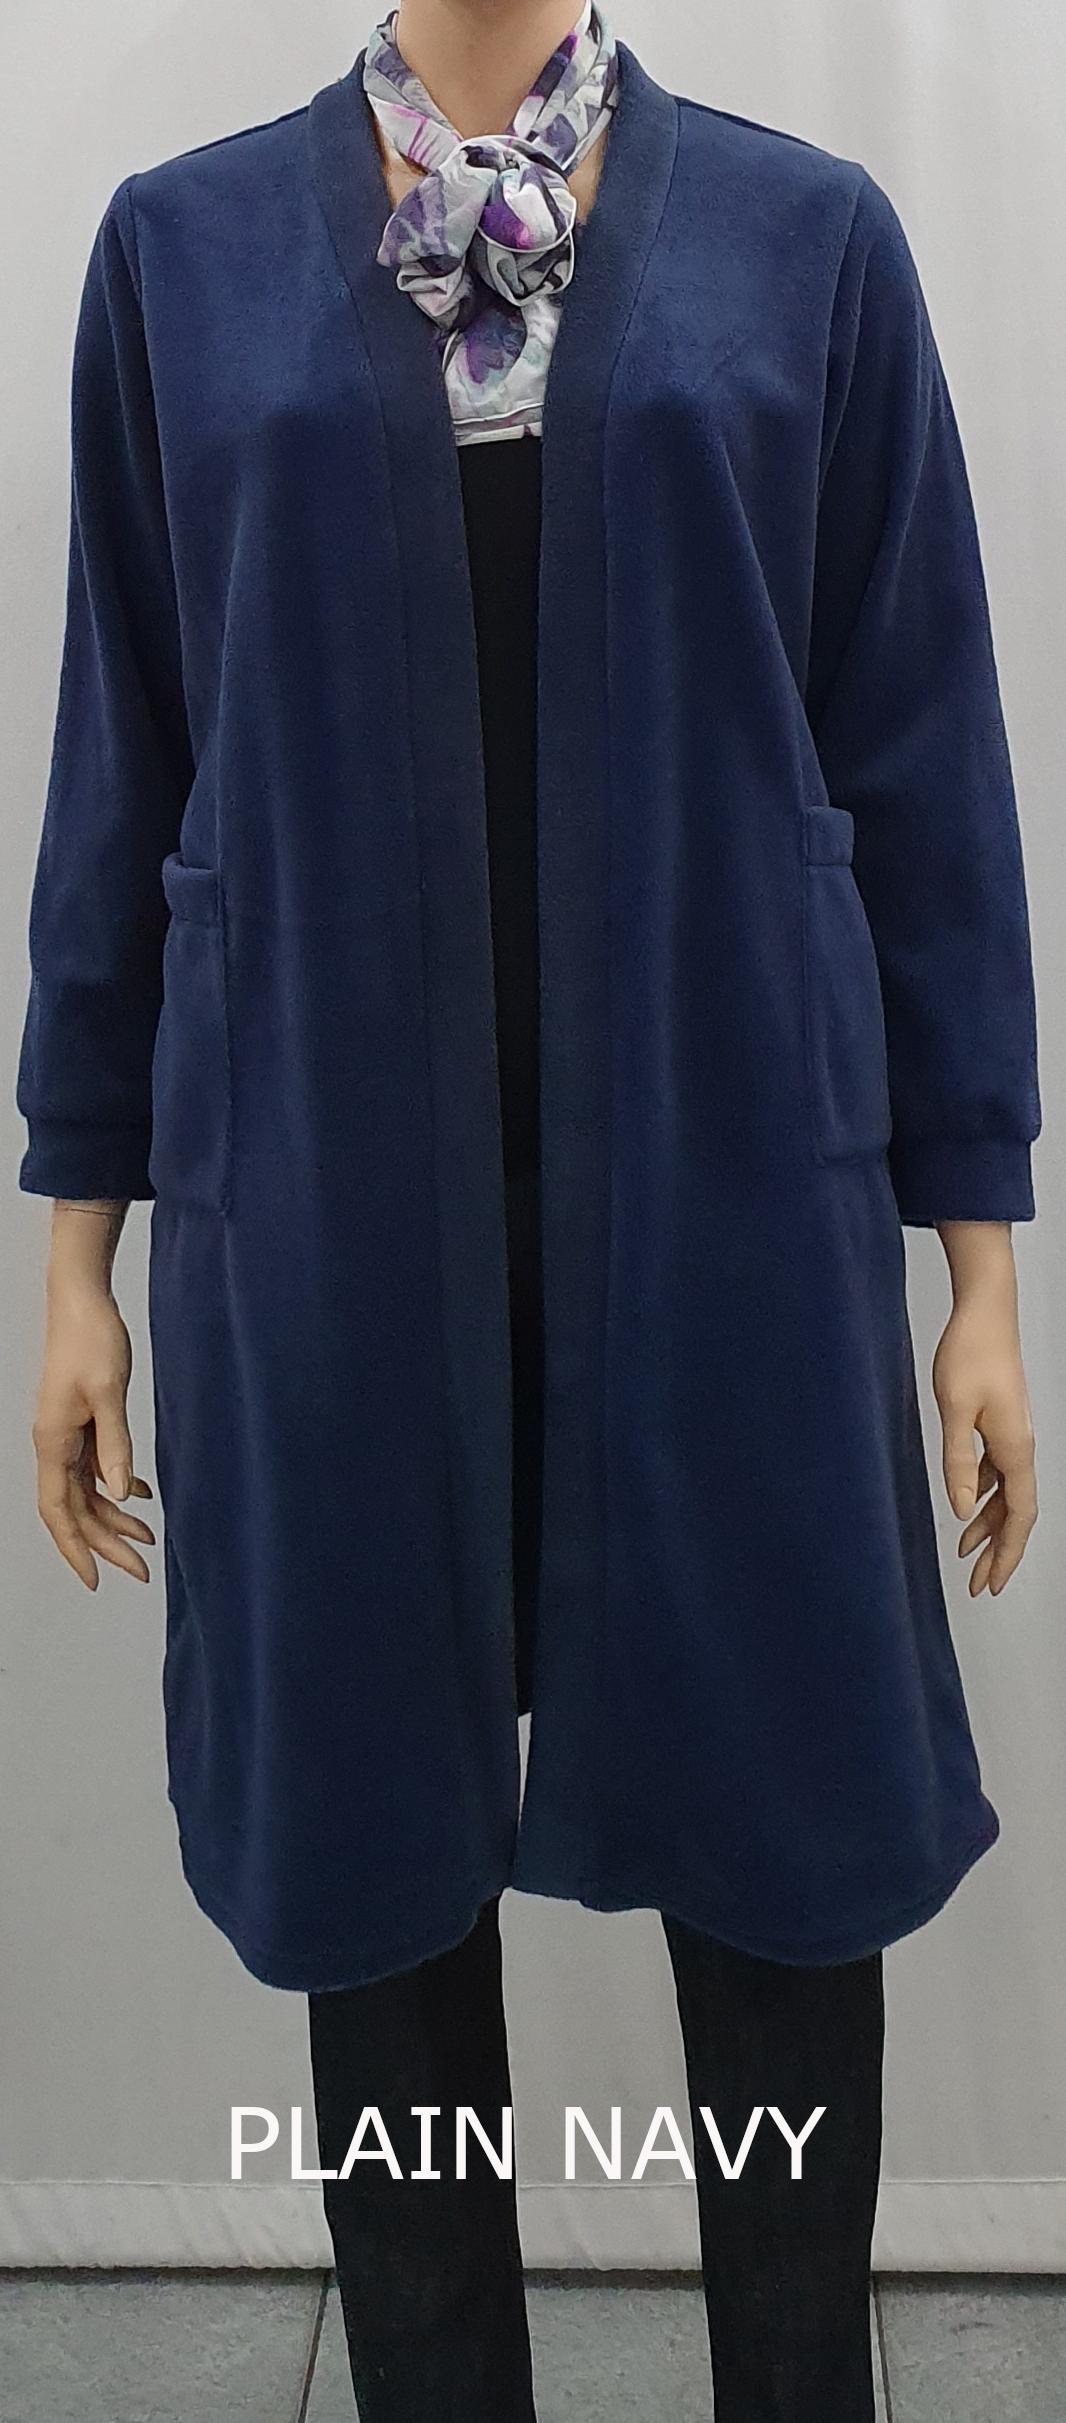 Ladies Jacket Lj1442 20 00 Plus Size Clothing